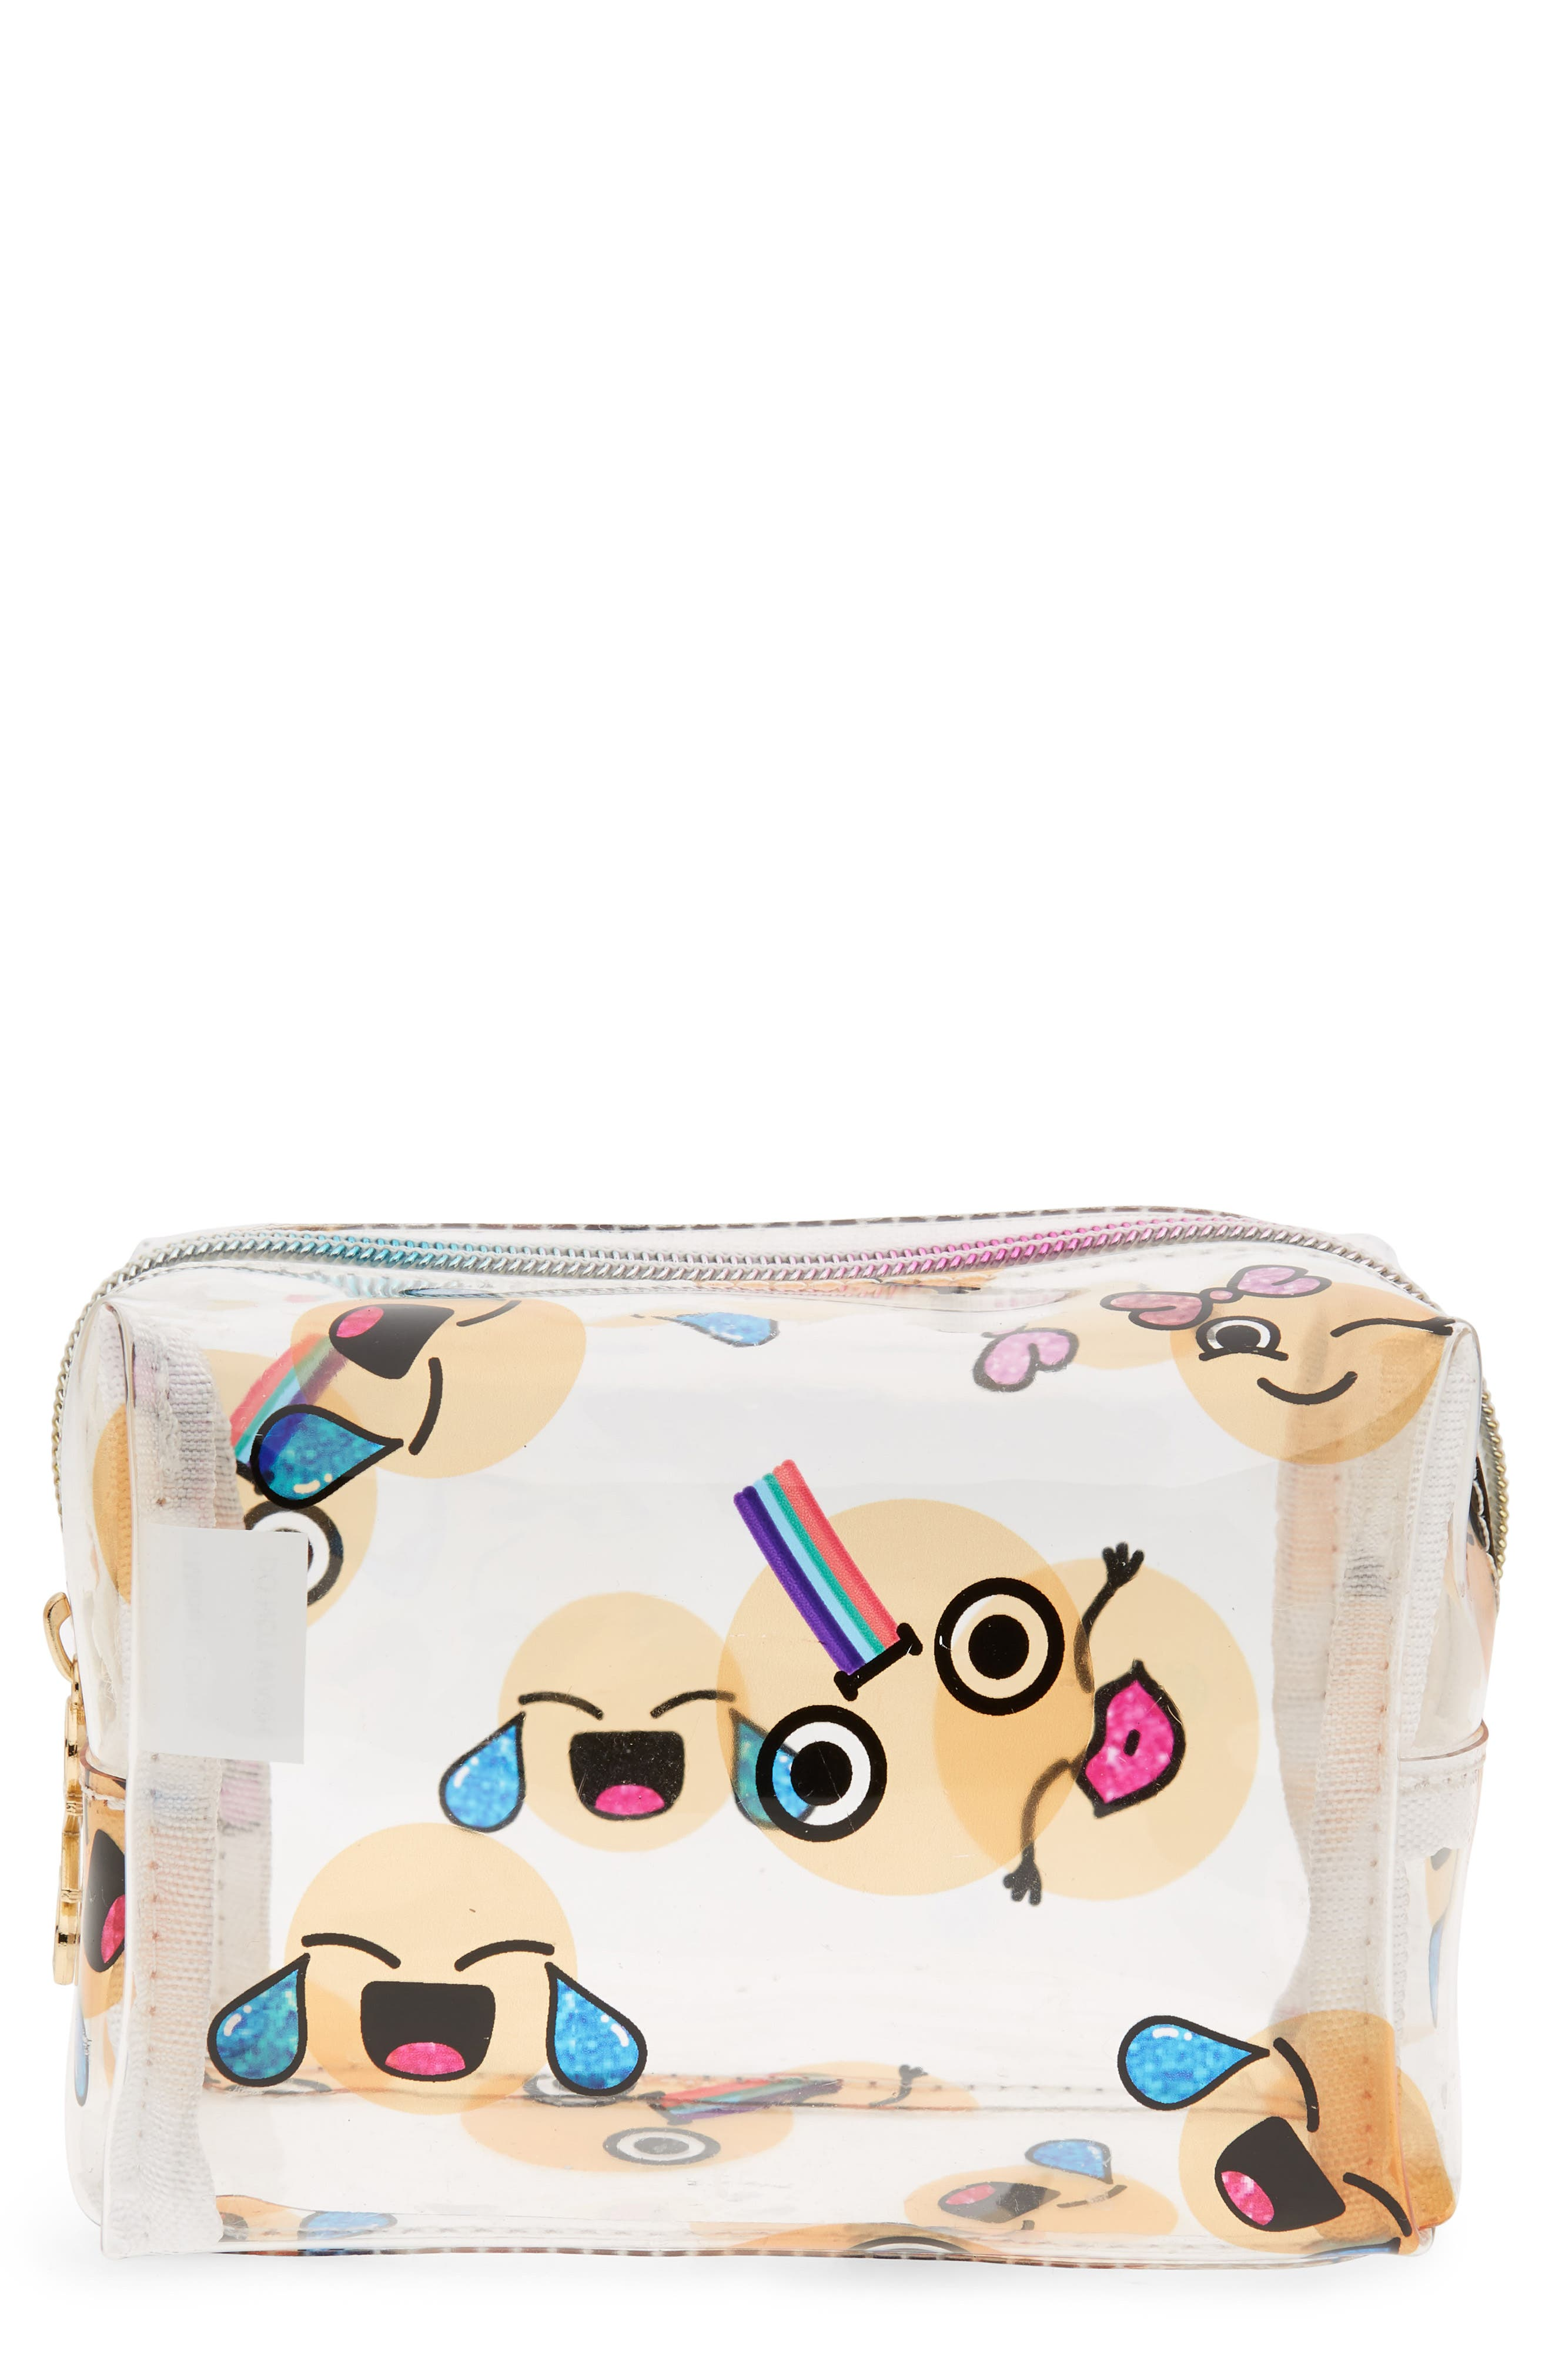 Emoji Cosmetics Case,                         Main,                         color, Multi